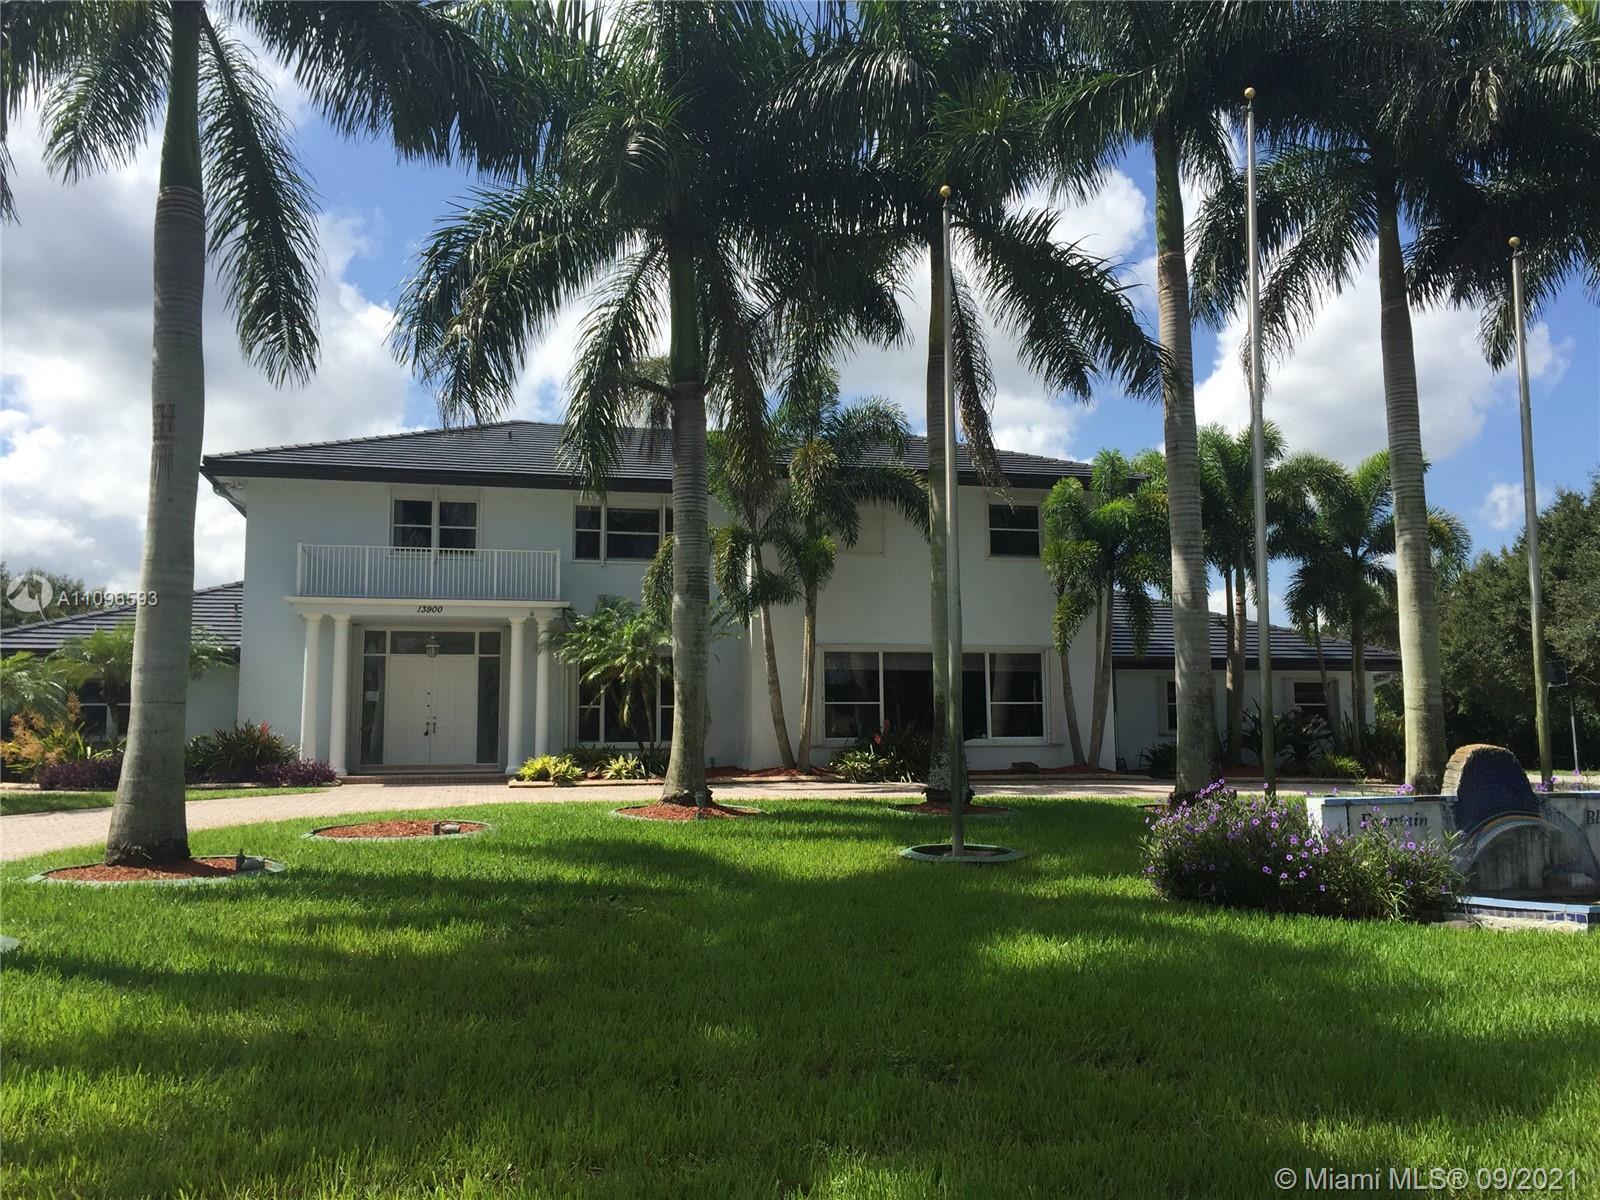 13900 24th St, Davie, Florida 33325